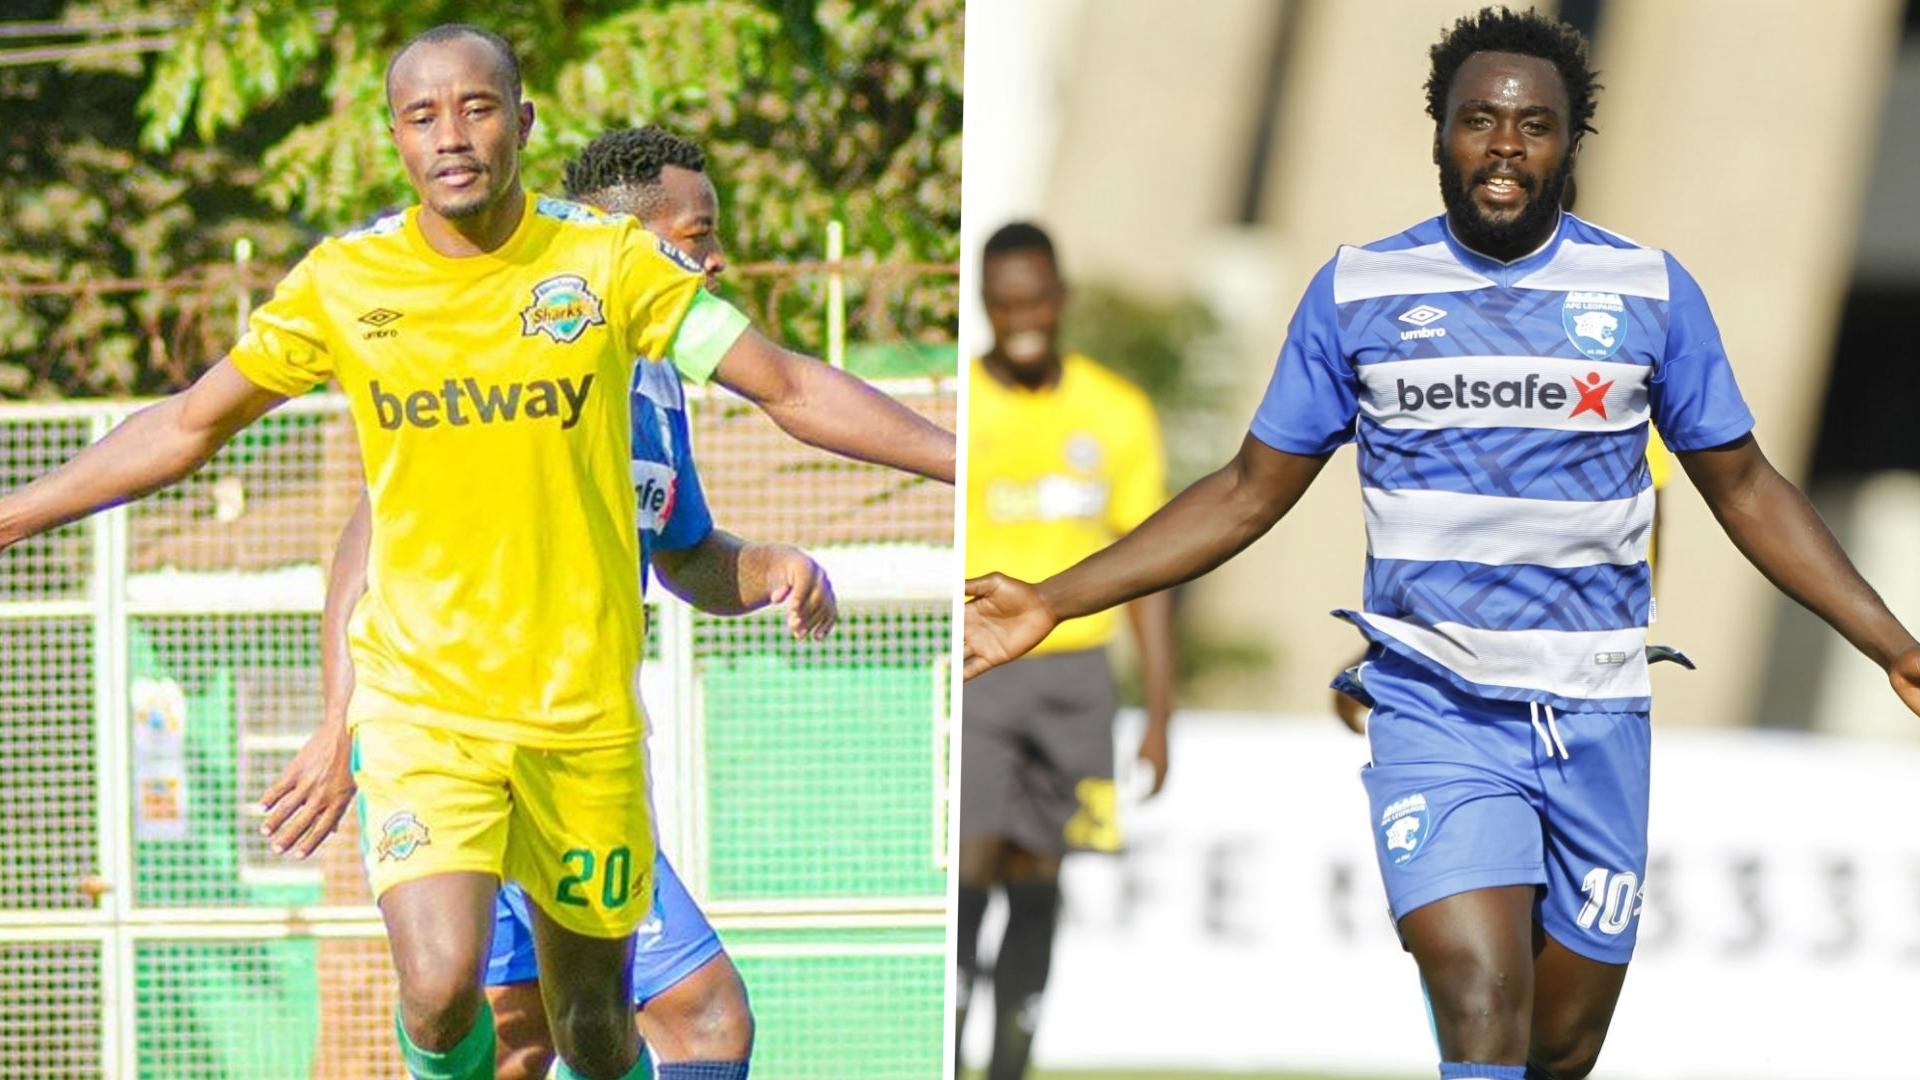 Will AFC Leopards' Rupia stop Kariobangi Sharks' Kapaito from winning FKF Golden Boot?